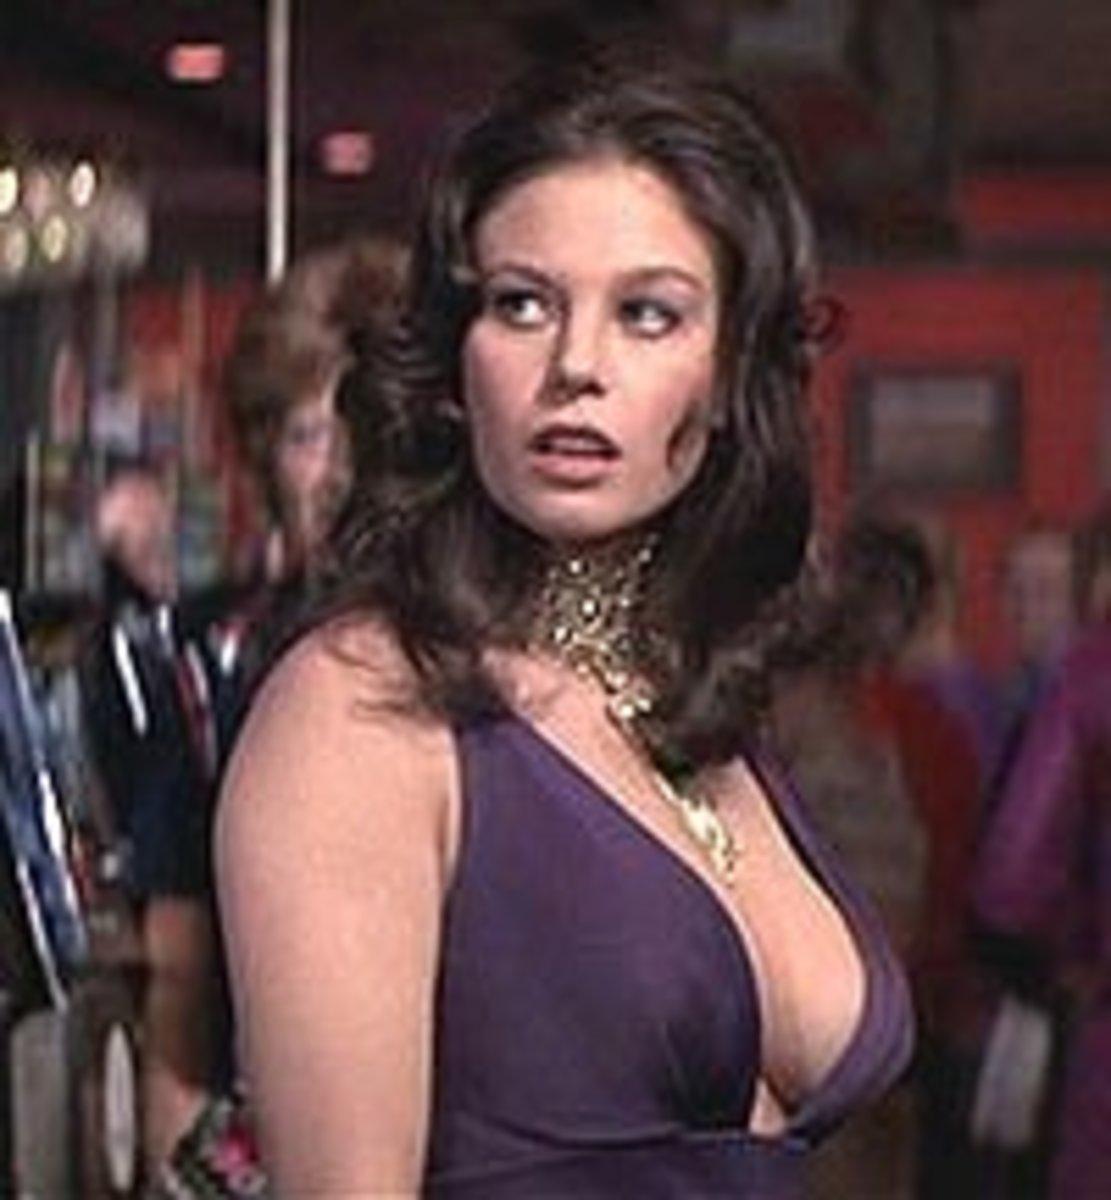 Lana Wood as Plenty O'Toole